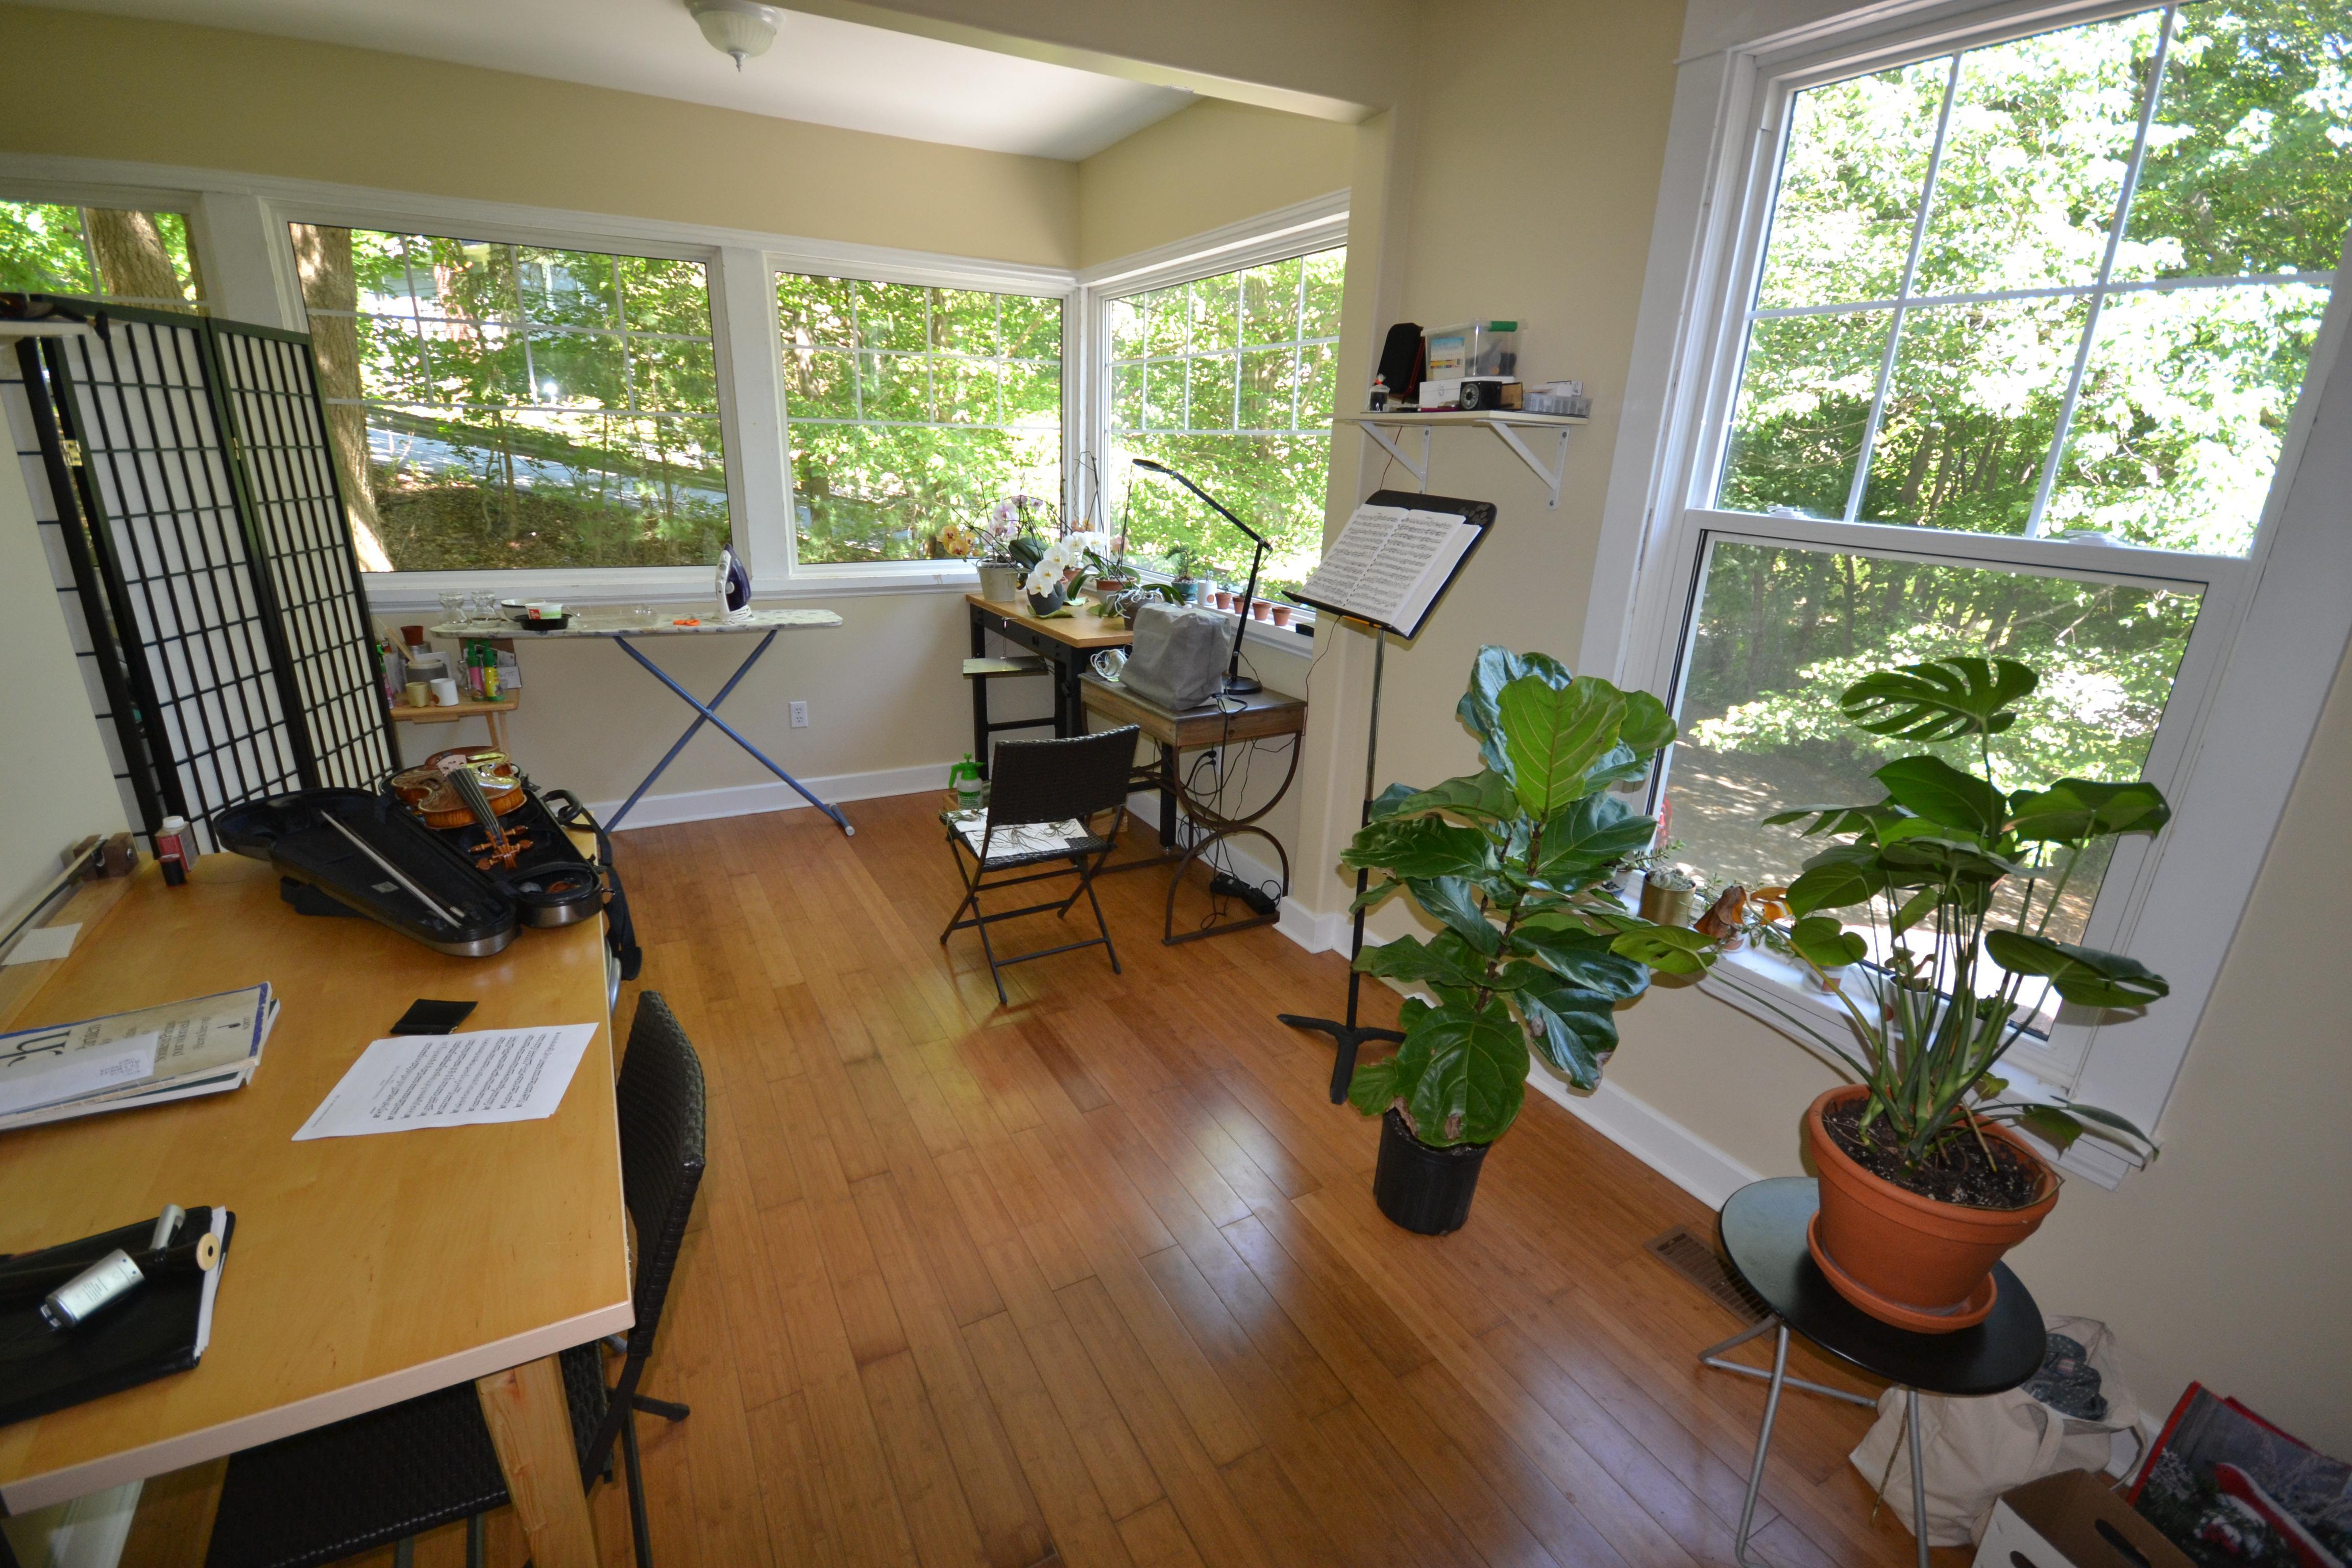 rental properties in halifax nova scotia gradpads. Black Bedroom Furniture Sets. Home Design Ideas